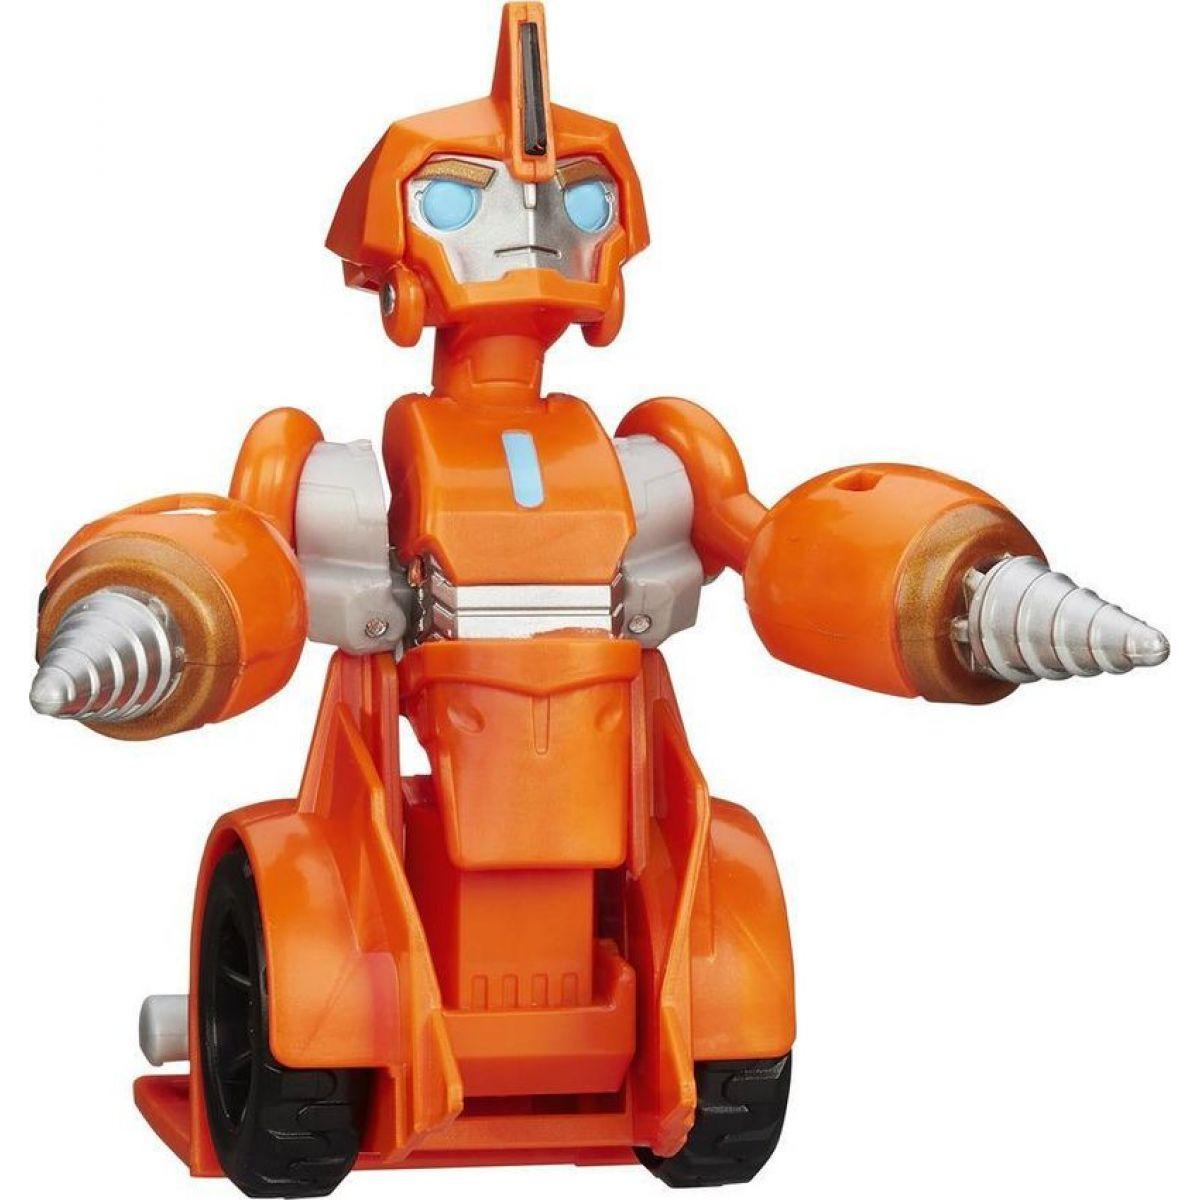 Hasbro Transformers RID Transformace v 1 kroku - Fixit